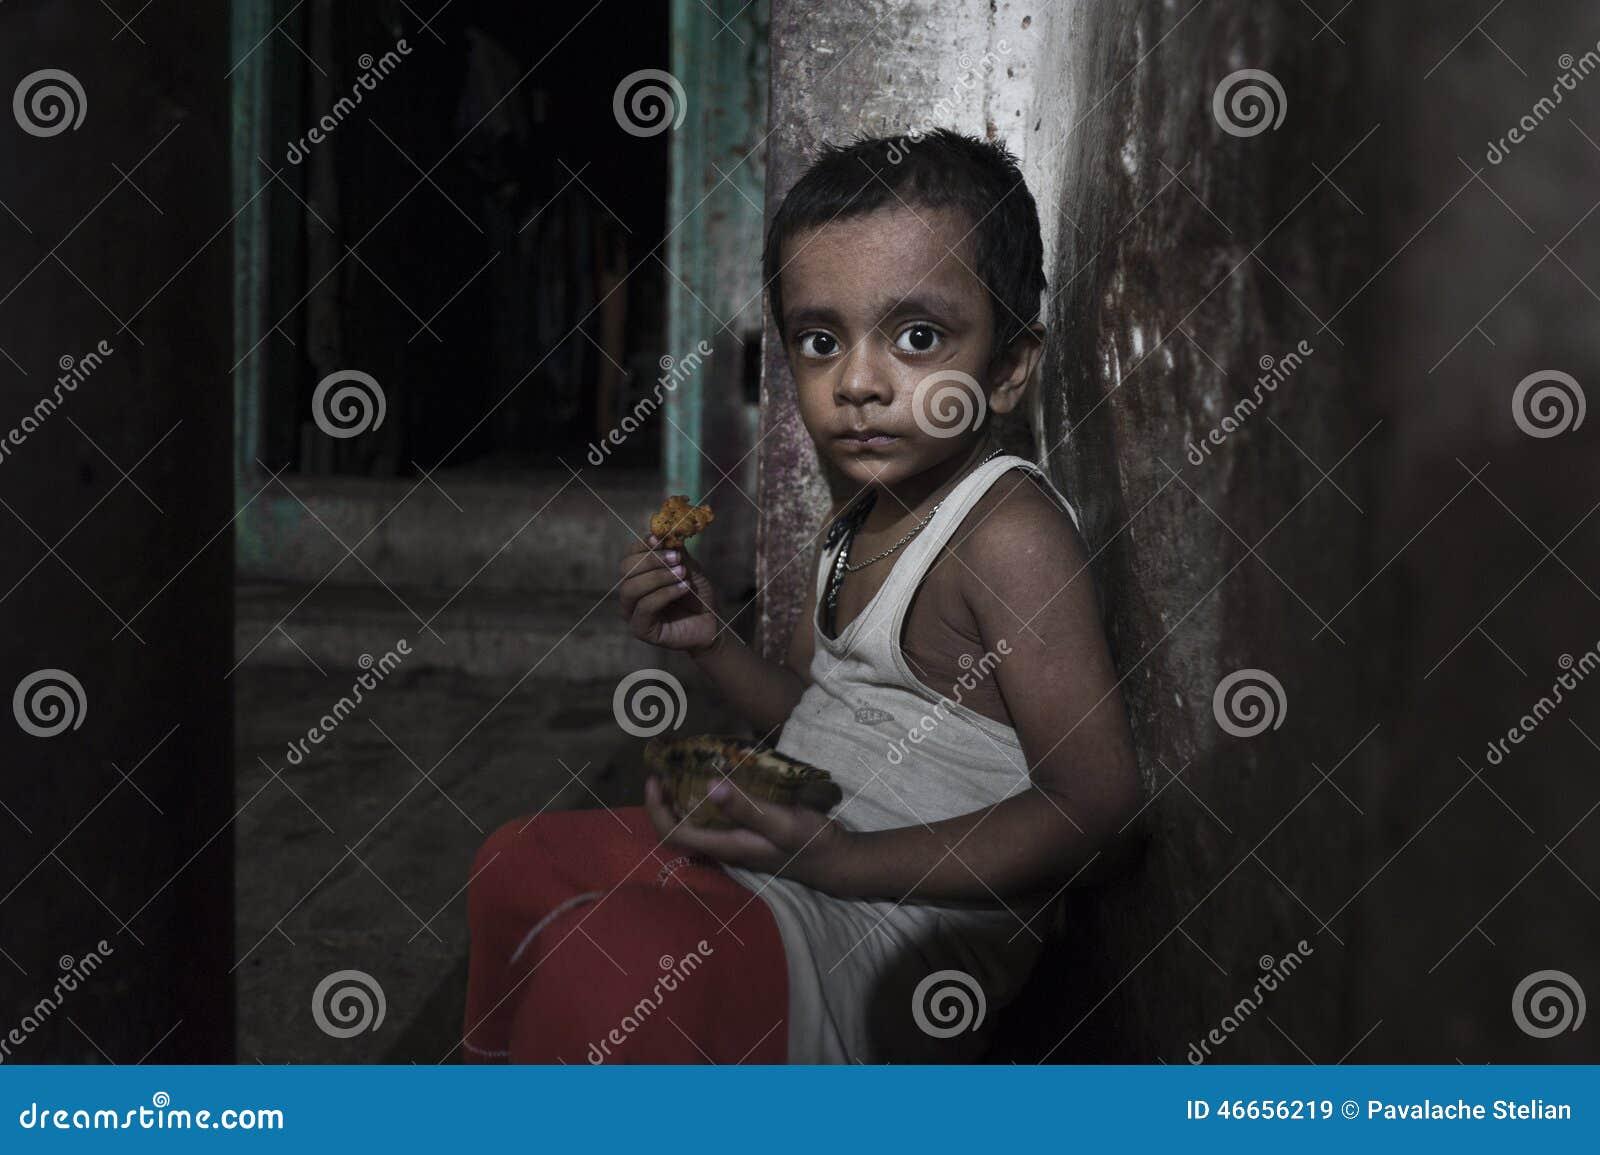 Poor children from old Godaulia city. Varanasi. India